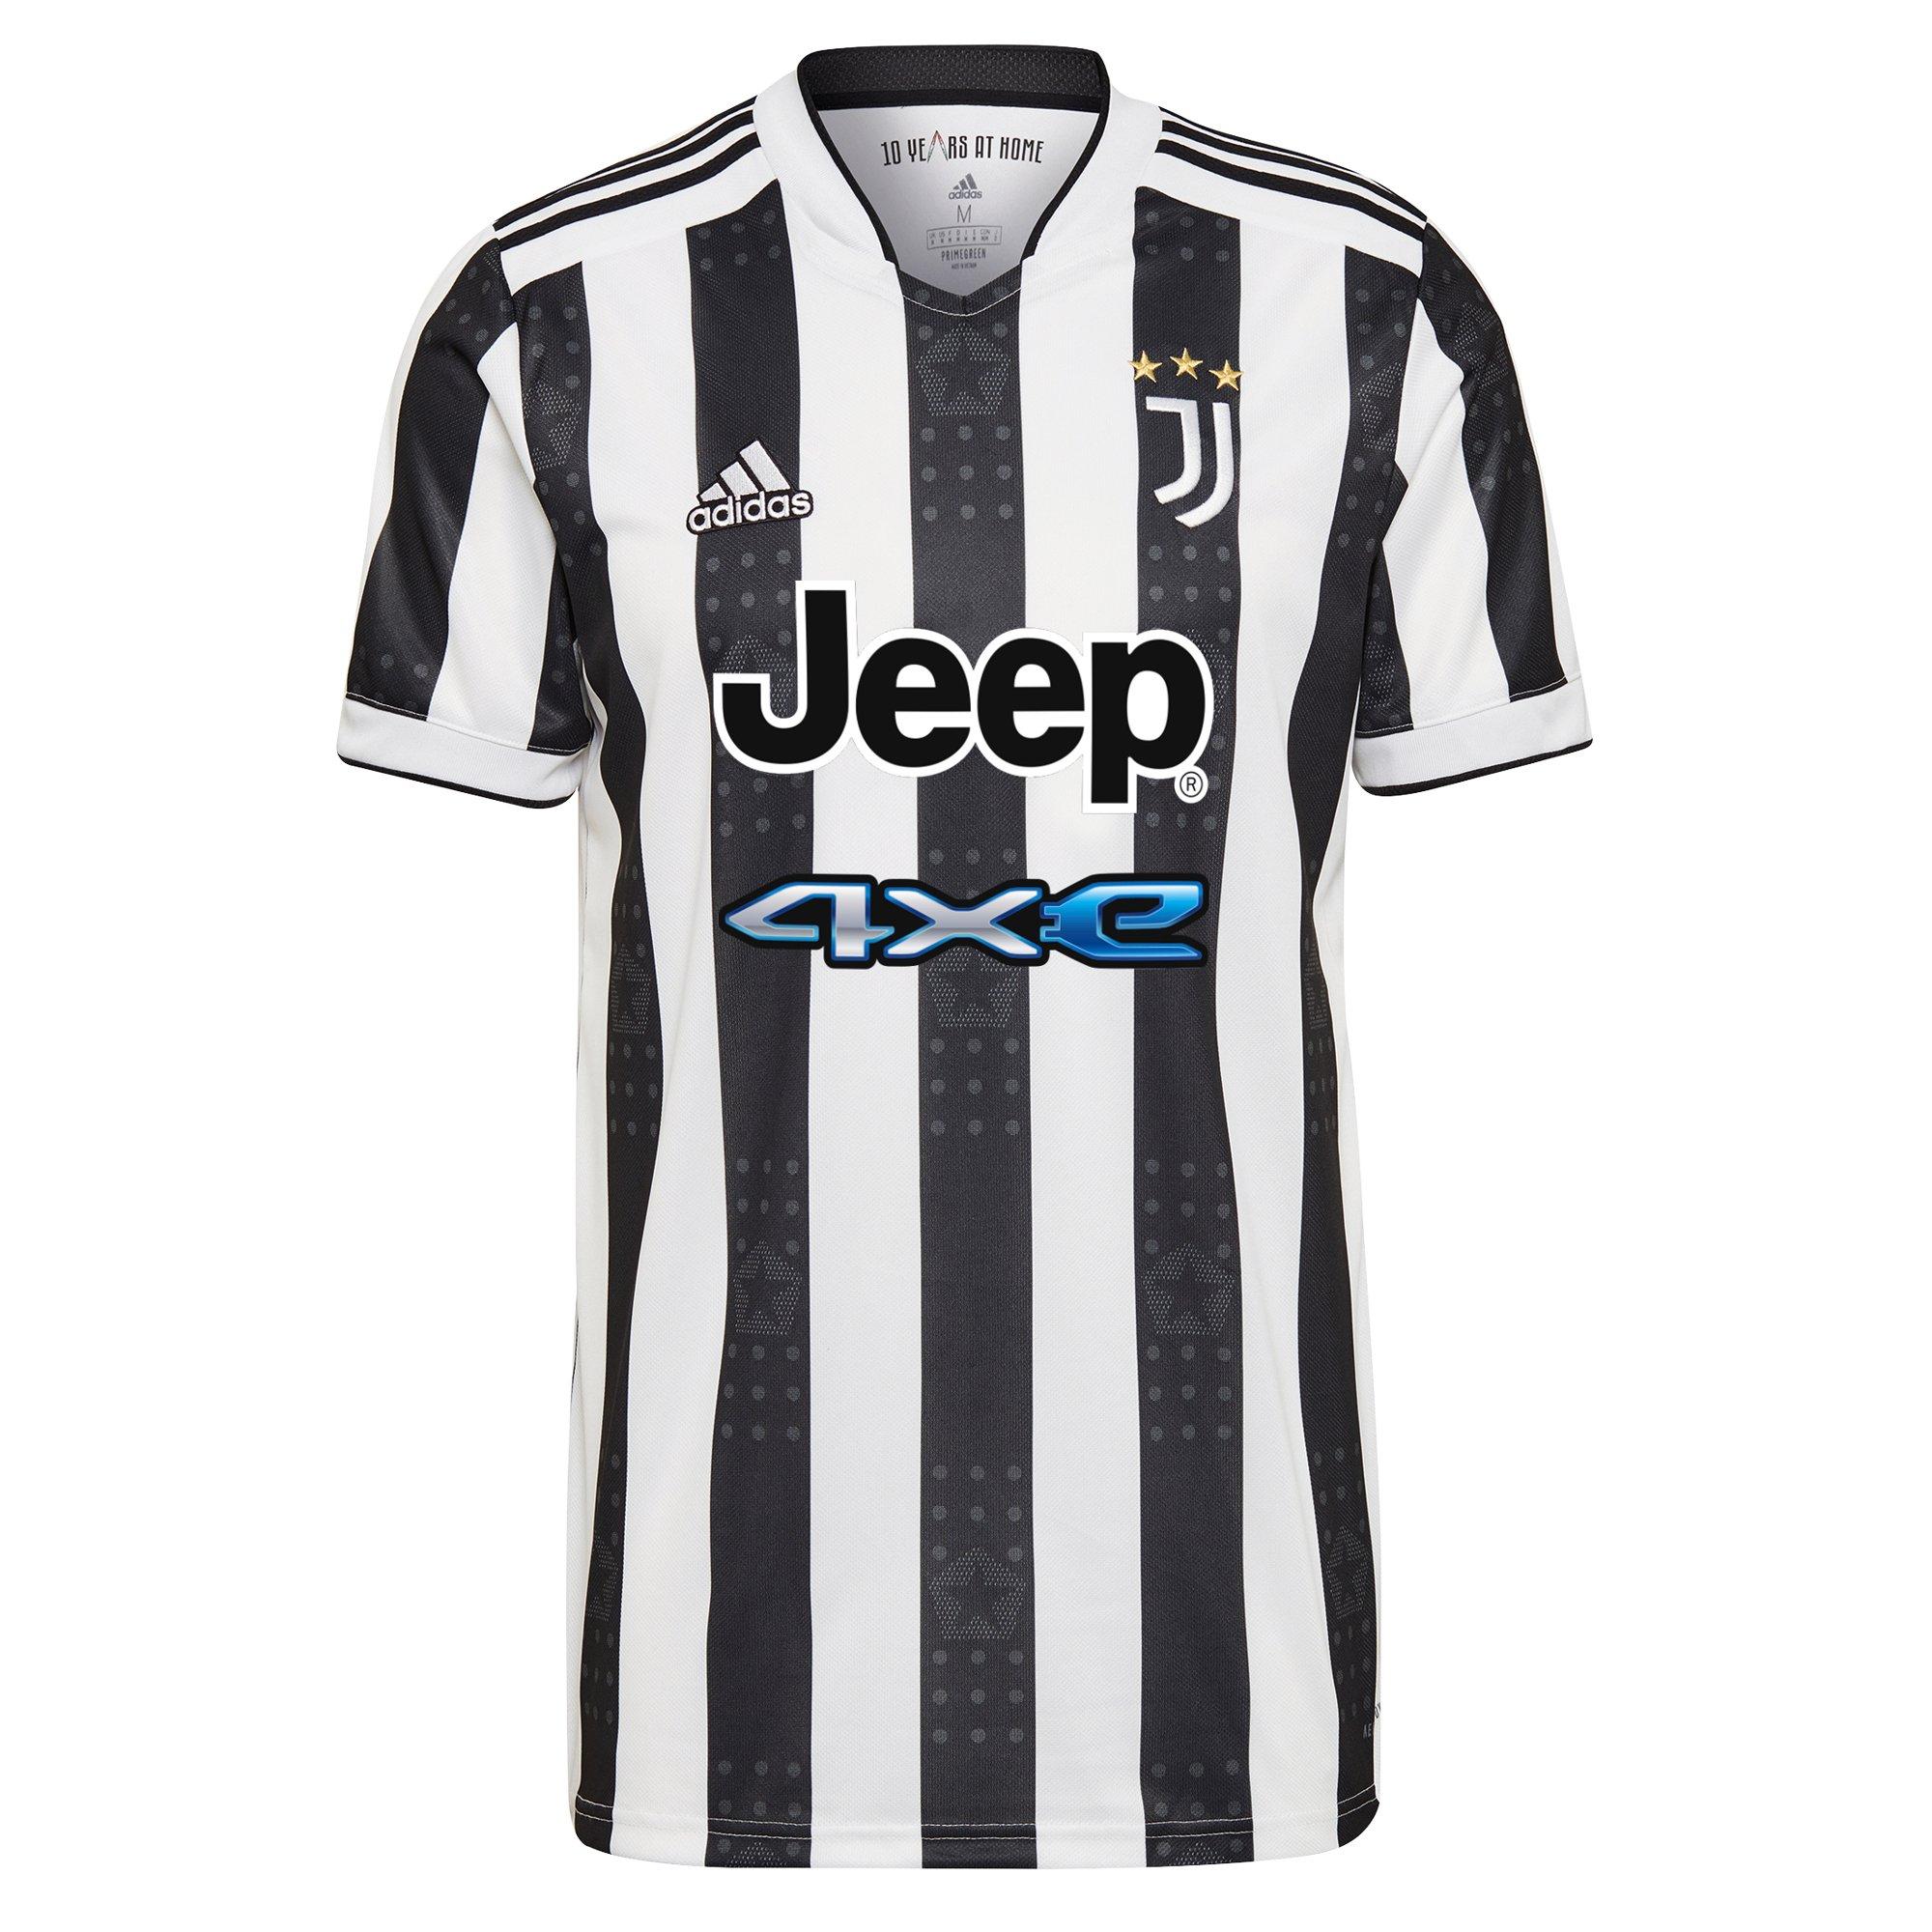 adidas Juventus Thuisshirt 2021-2022